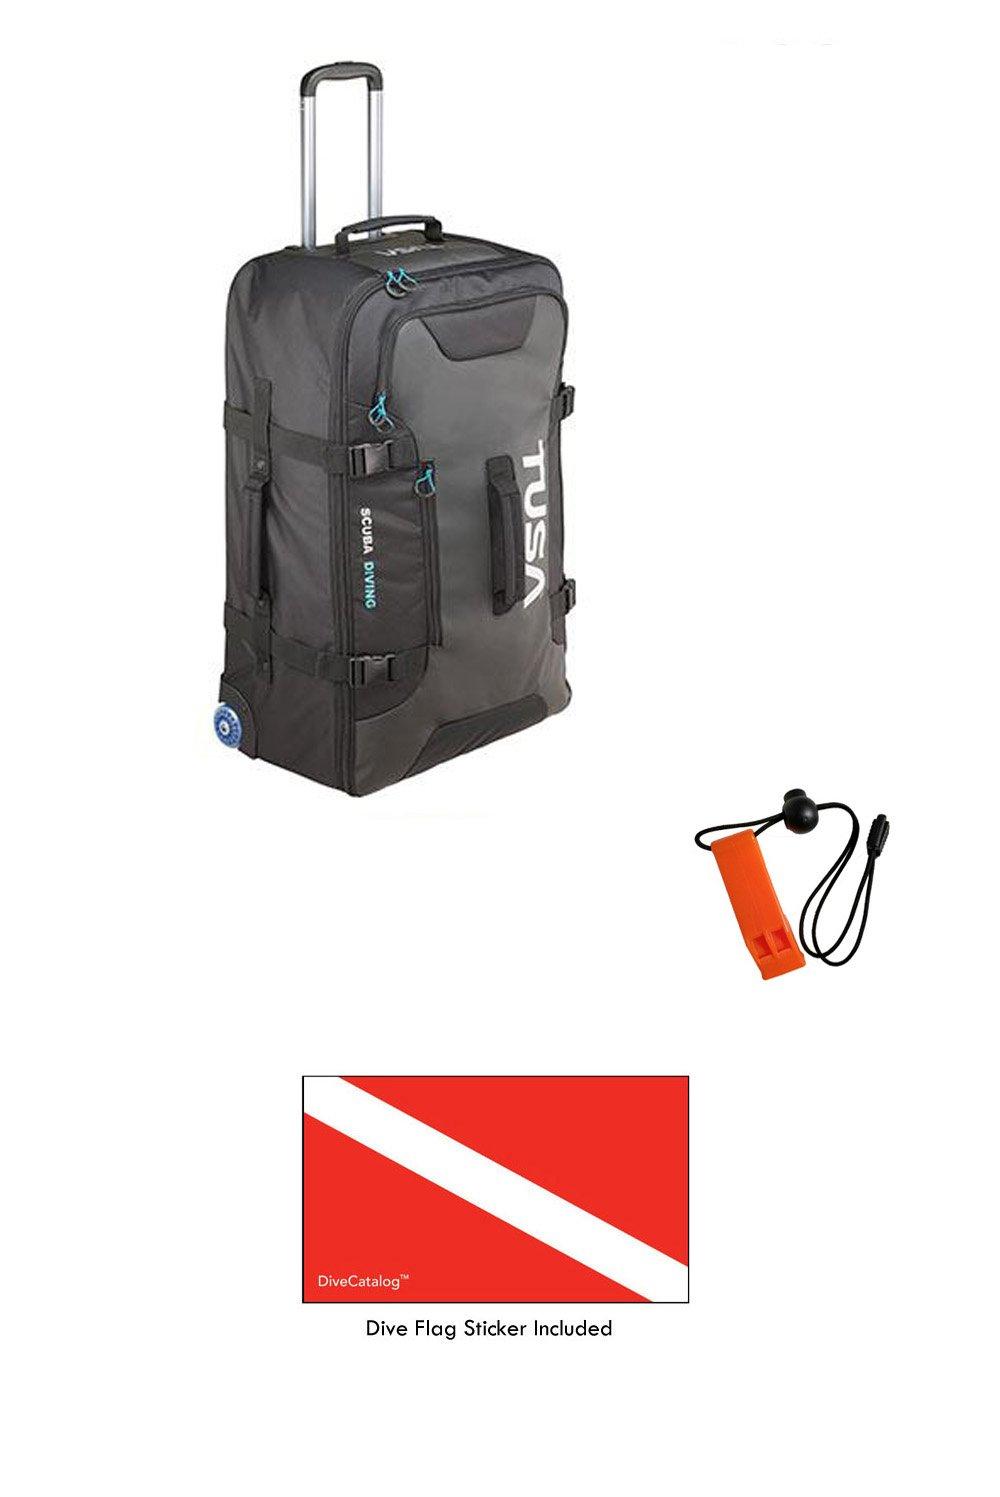 Tusa Large Roller Bag in Black & DiveCatalog's Orange Whistle w/Lanyard & Dive Flag Sticker by Tusa